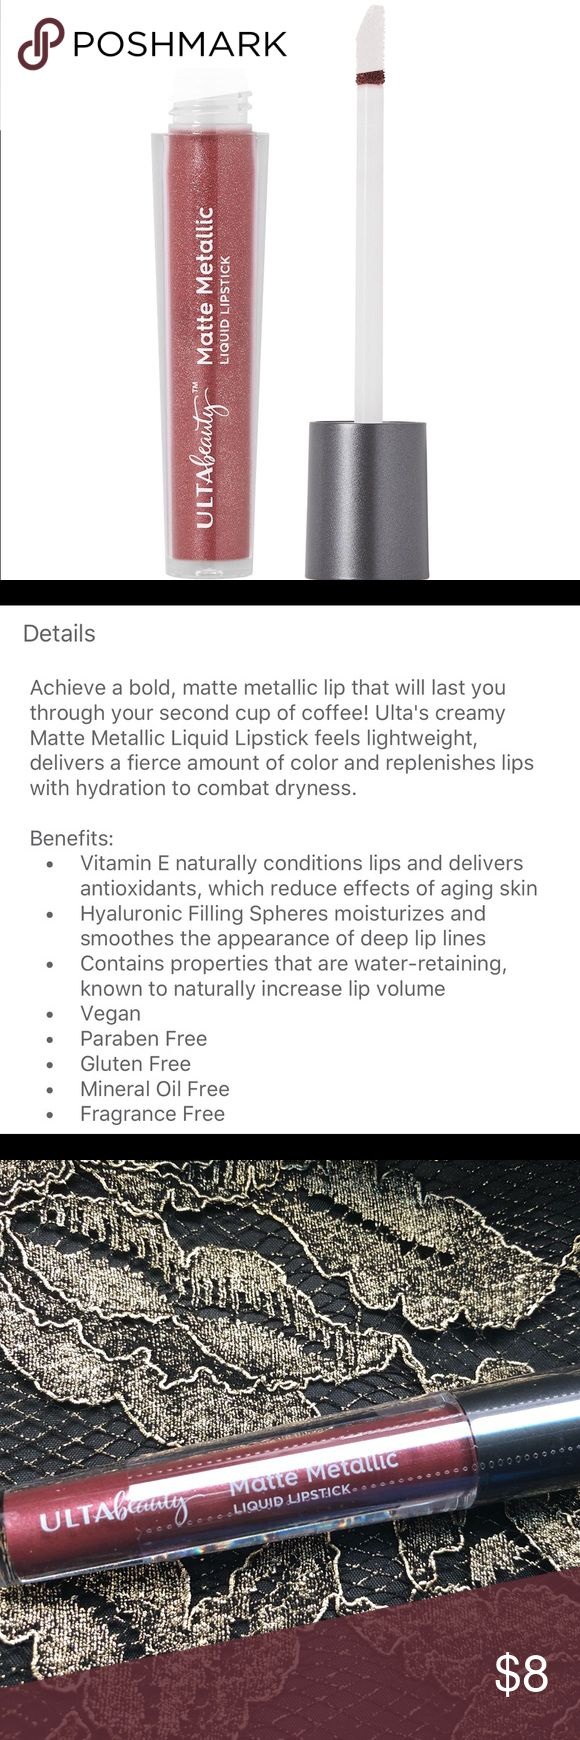 ulta beauty matte metallic liquid lipstick brand new